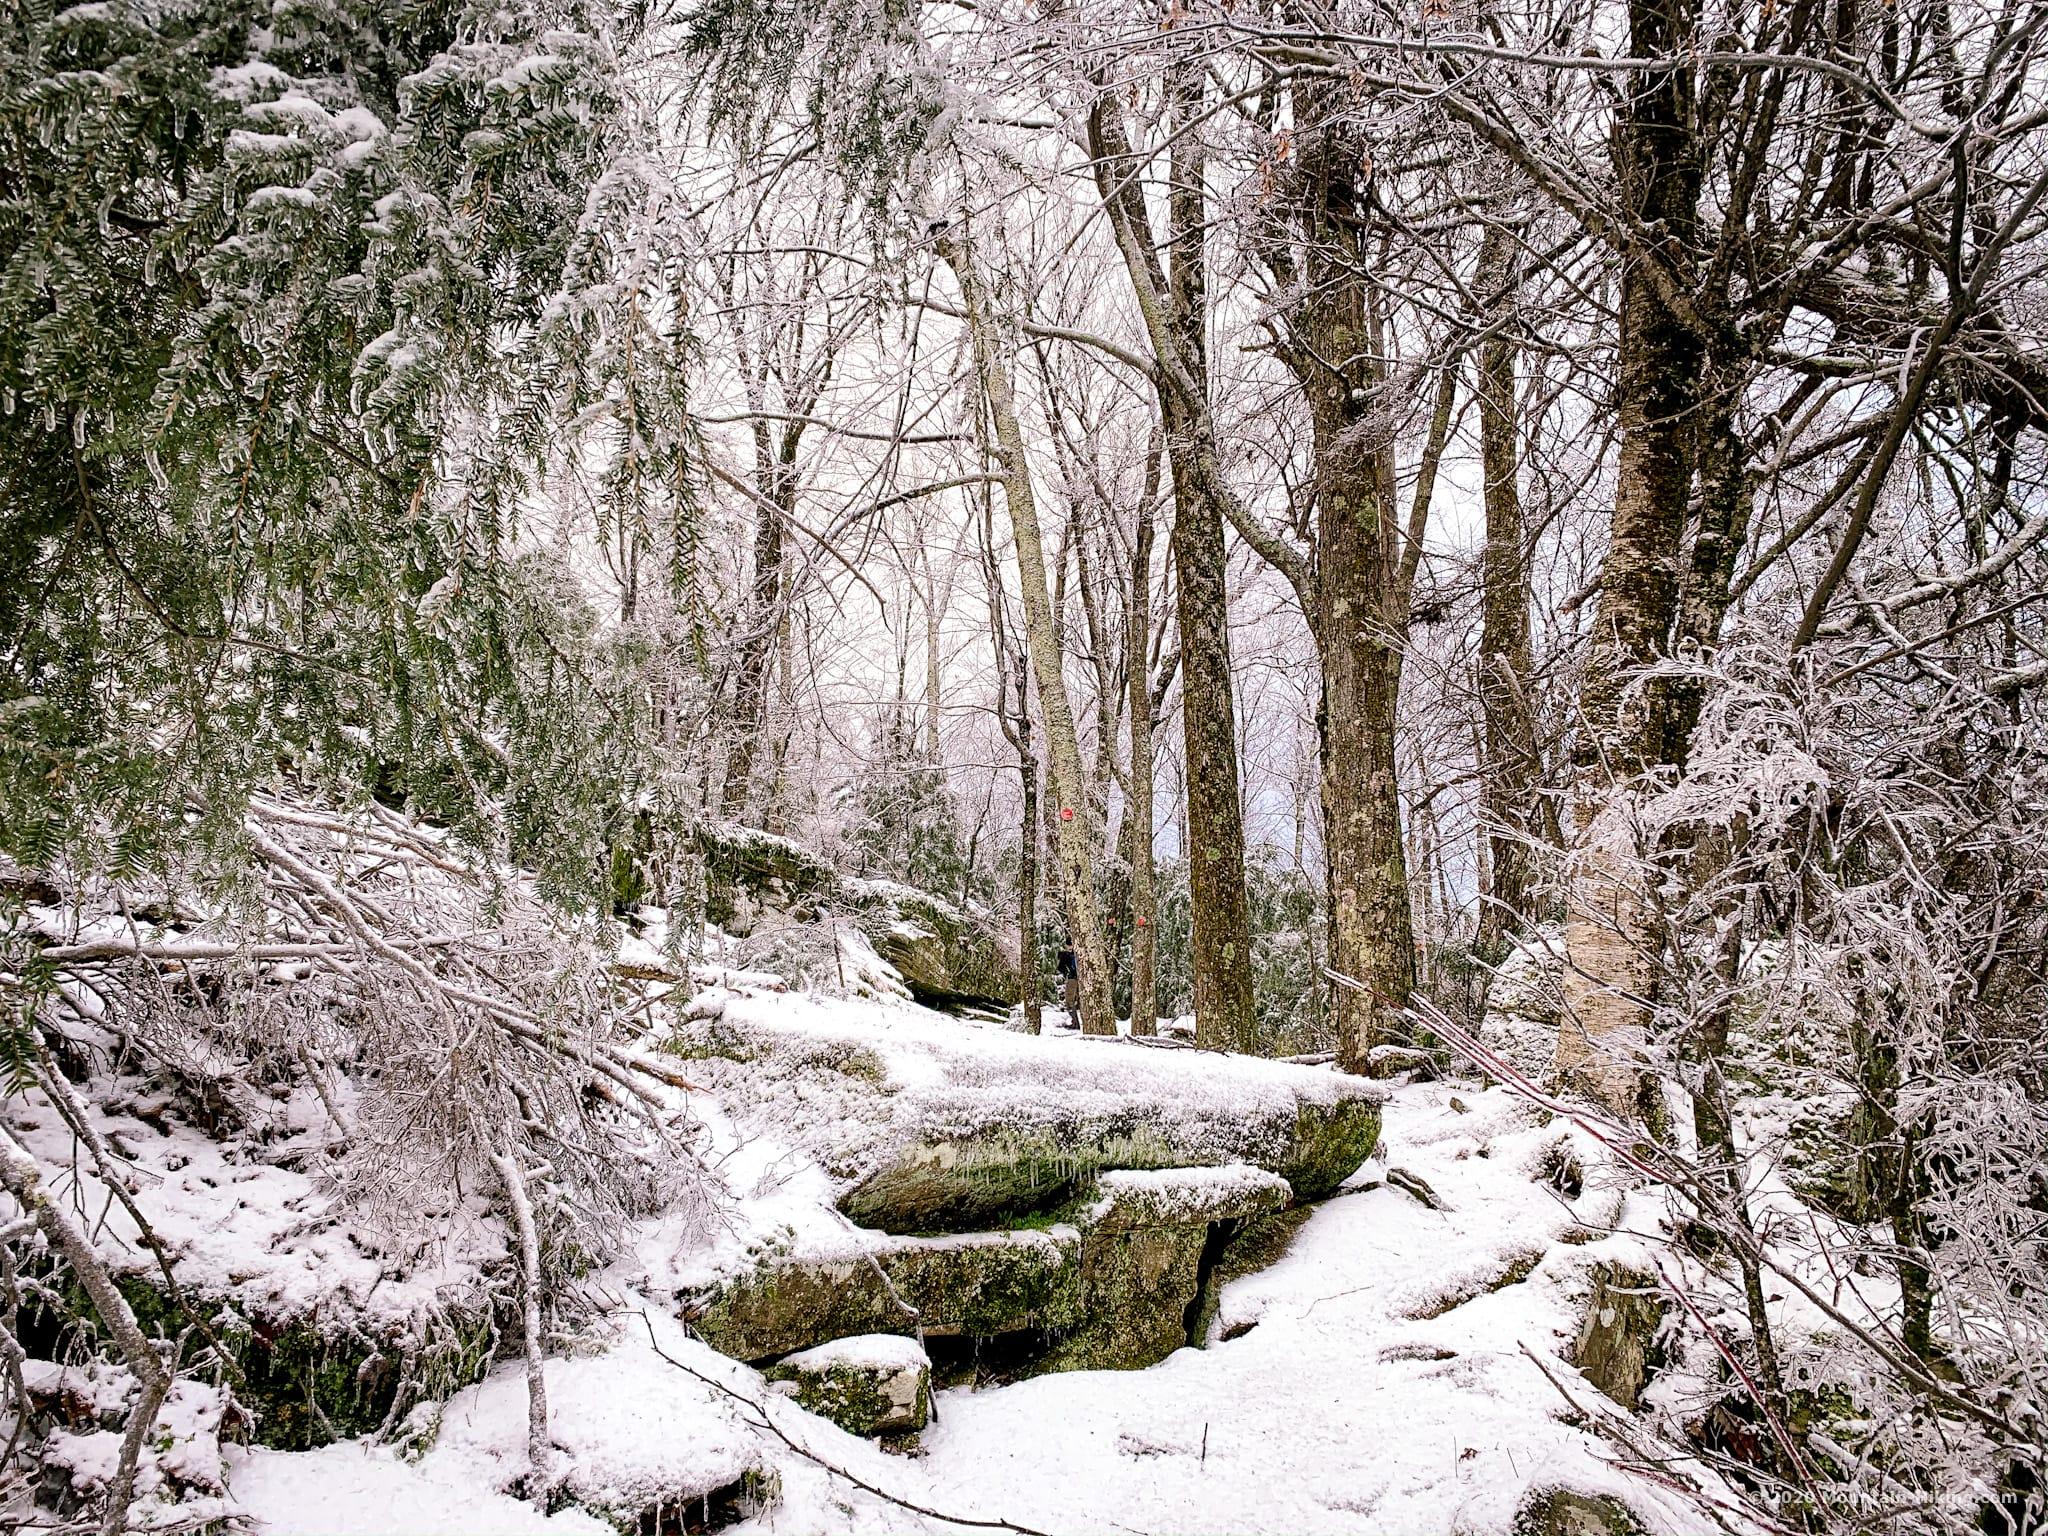 Wittenberg hiking trail